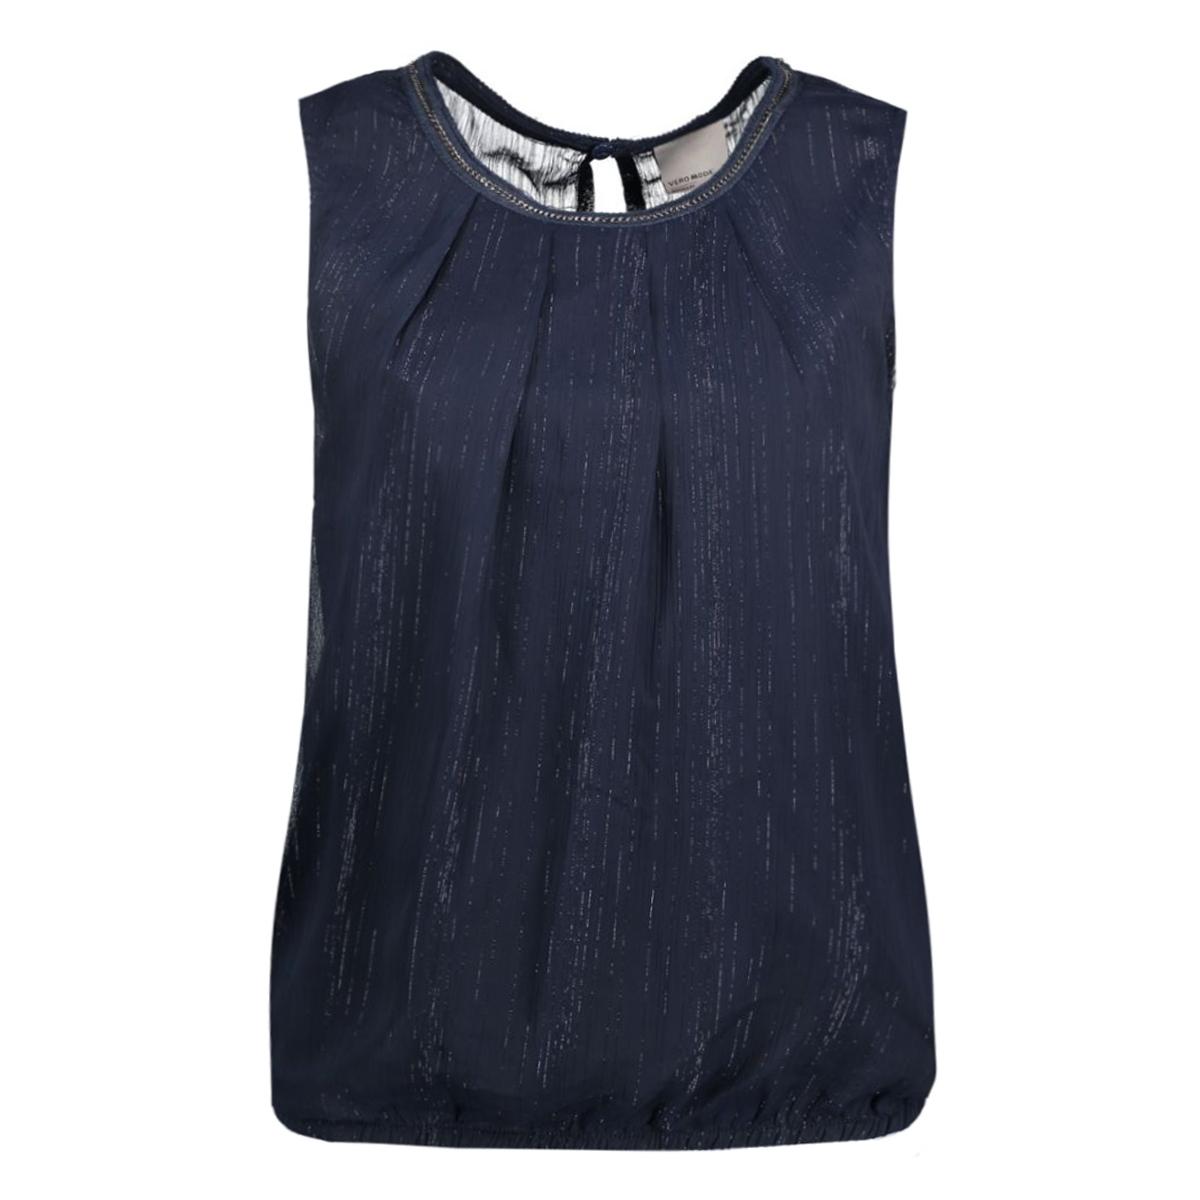 vmsimple glitter s/l top 10163860 vero moda top navy blazer